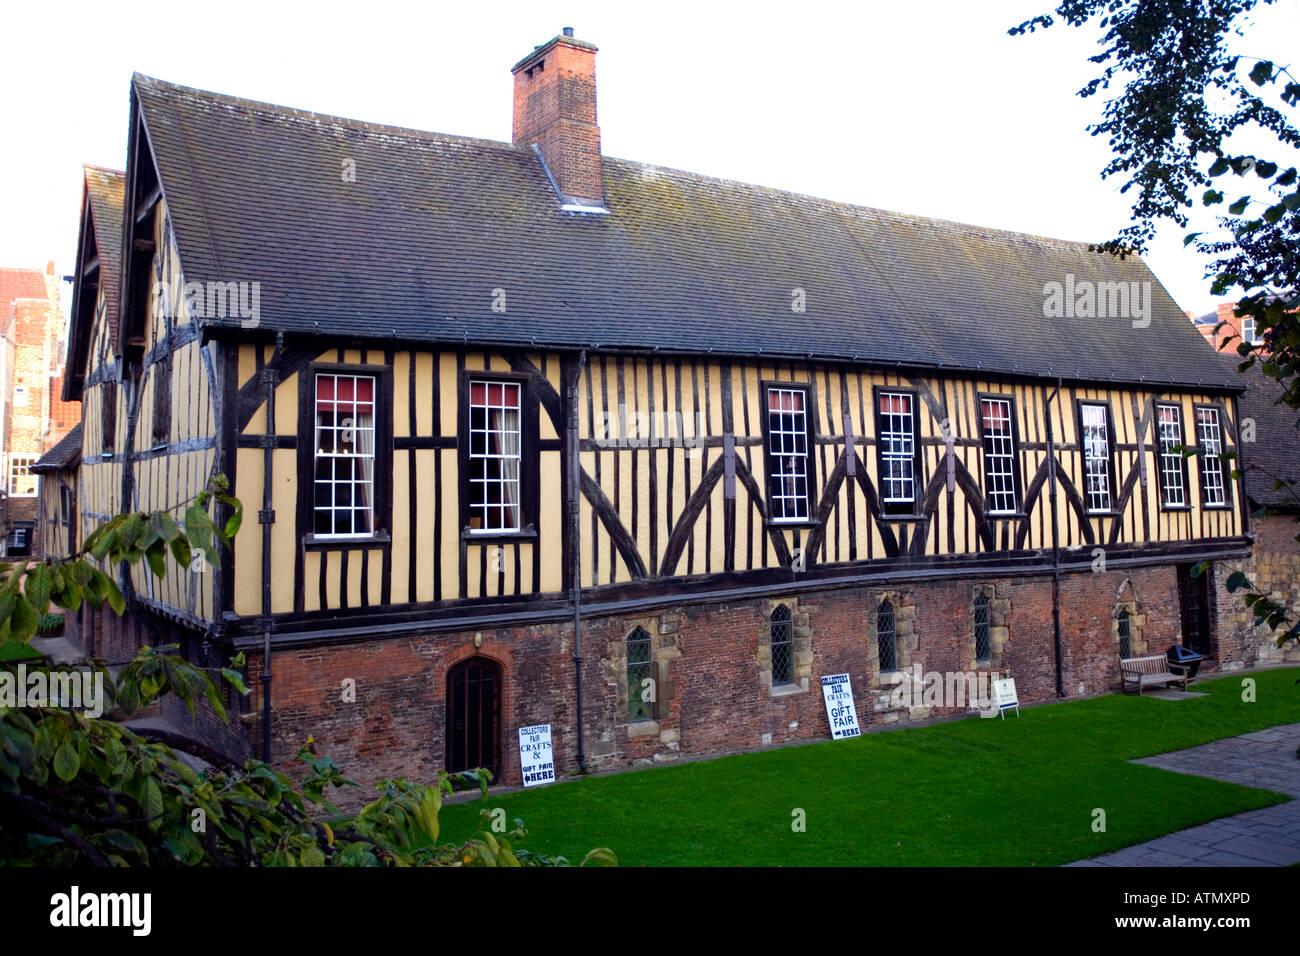 Merchant Adventurers' Hall Fossgate York England - Stock Image